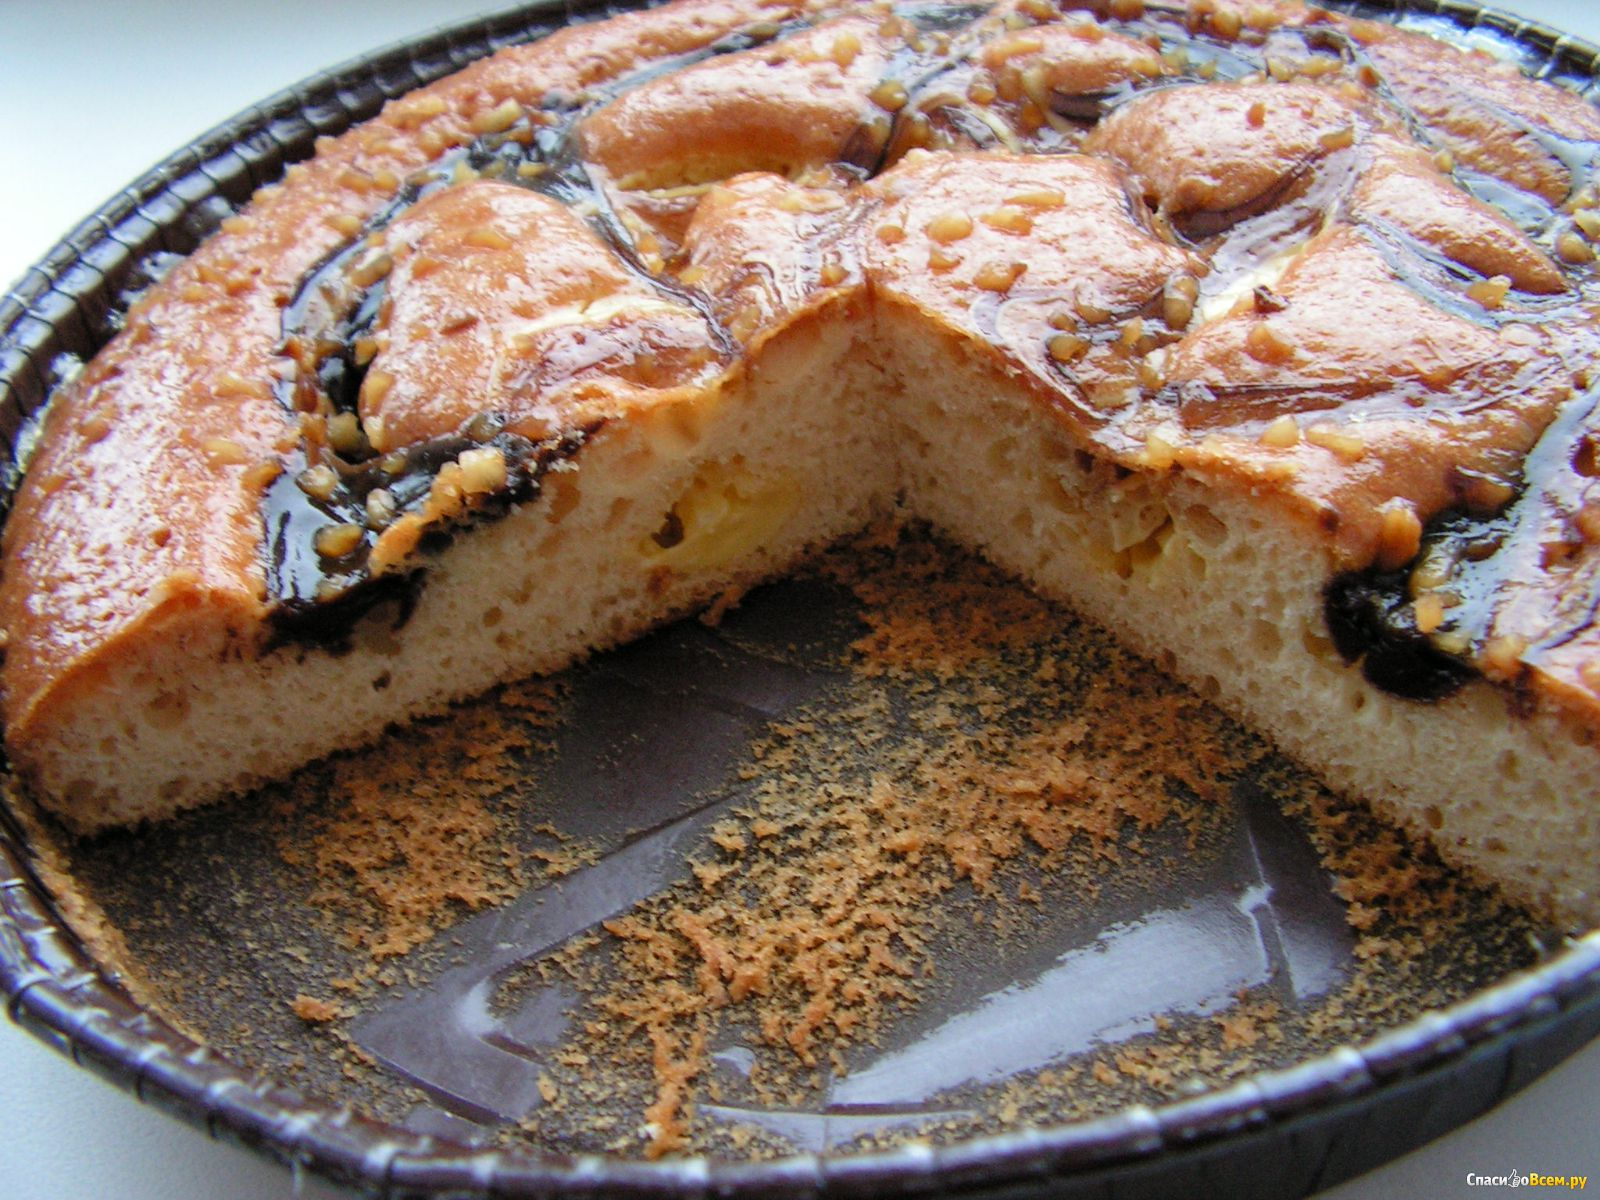 Пироги с изюмом и грецким орехом рецепт пошагово в